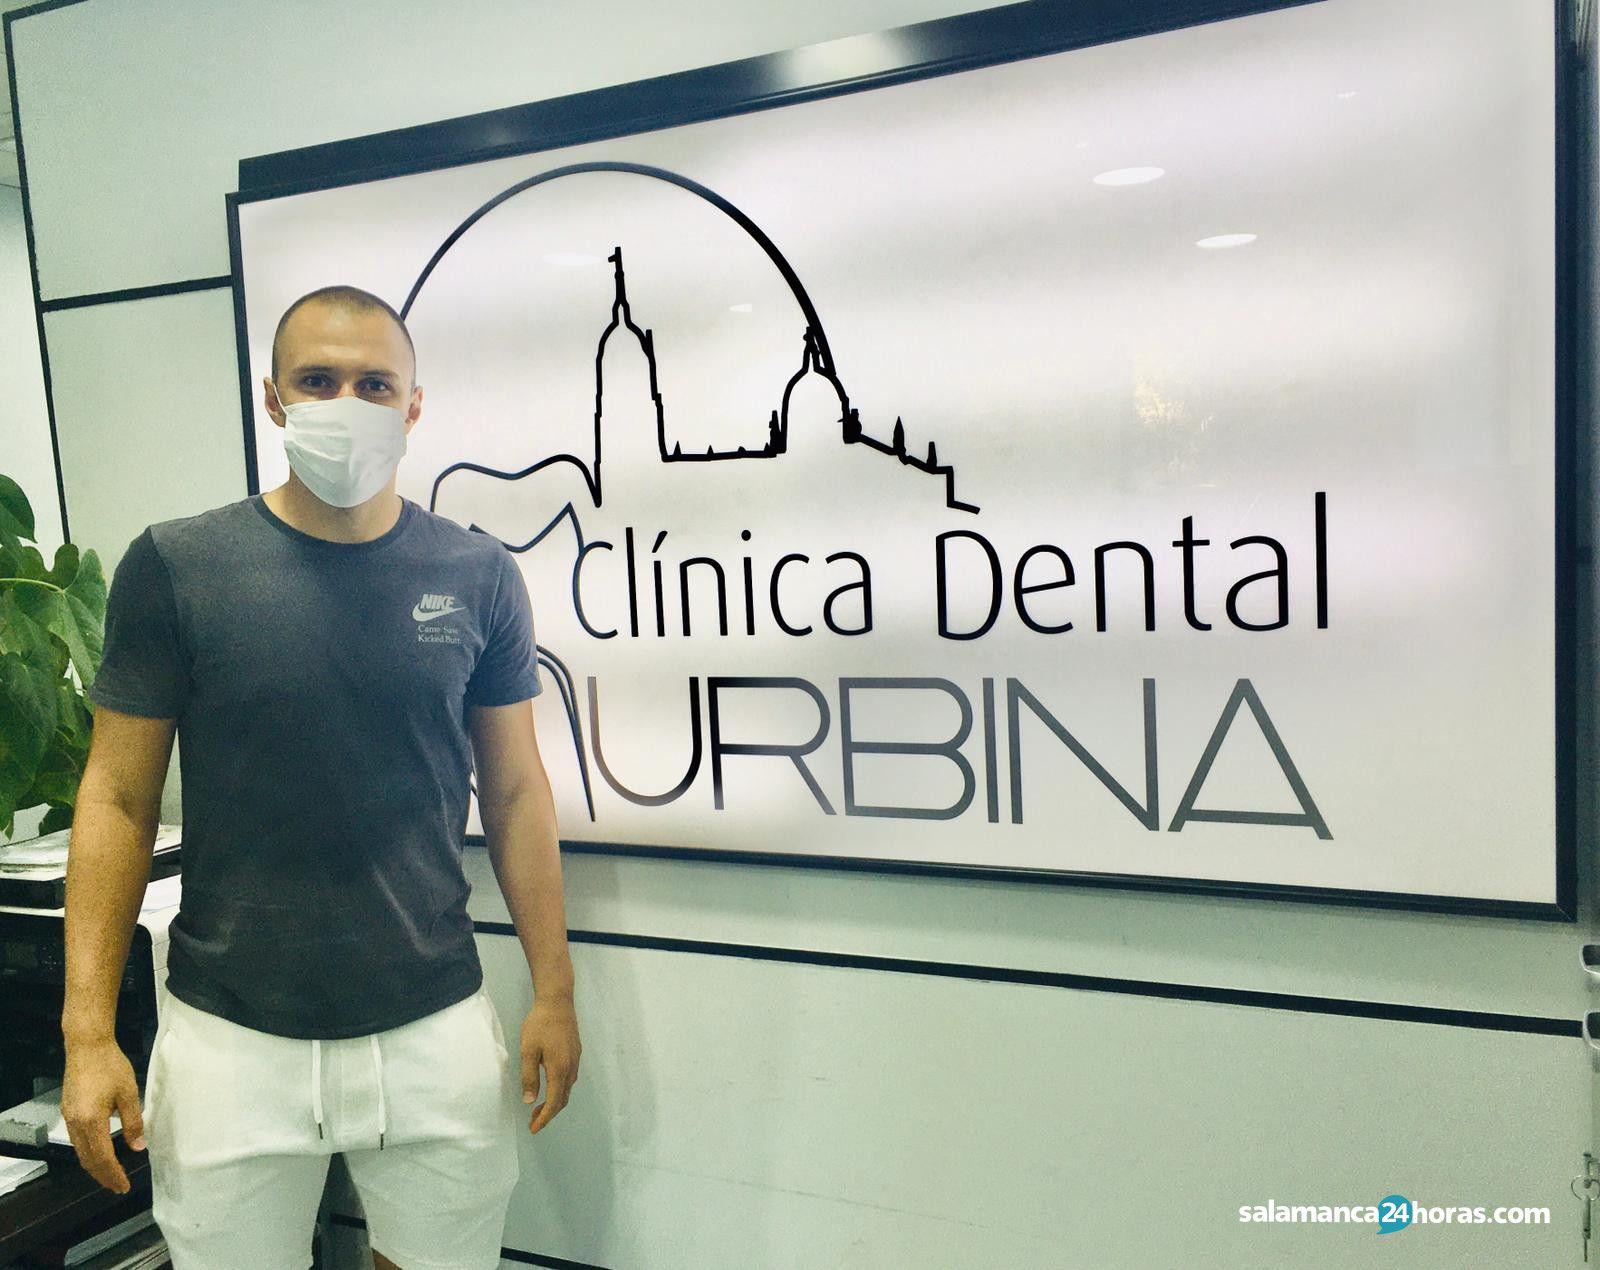 Kristian en Cli?nica Dental Urbina